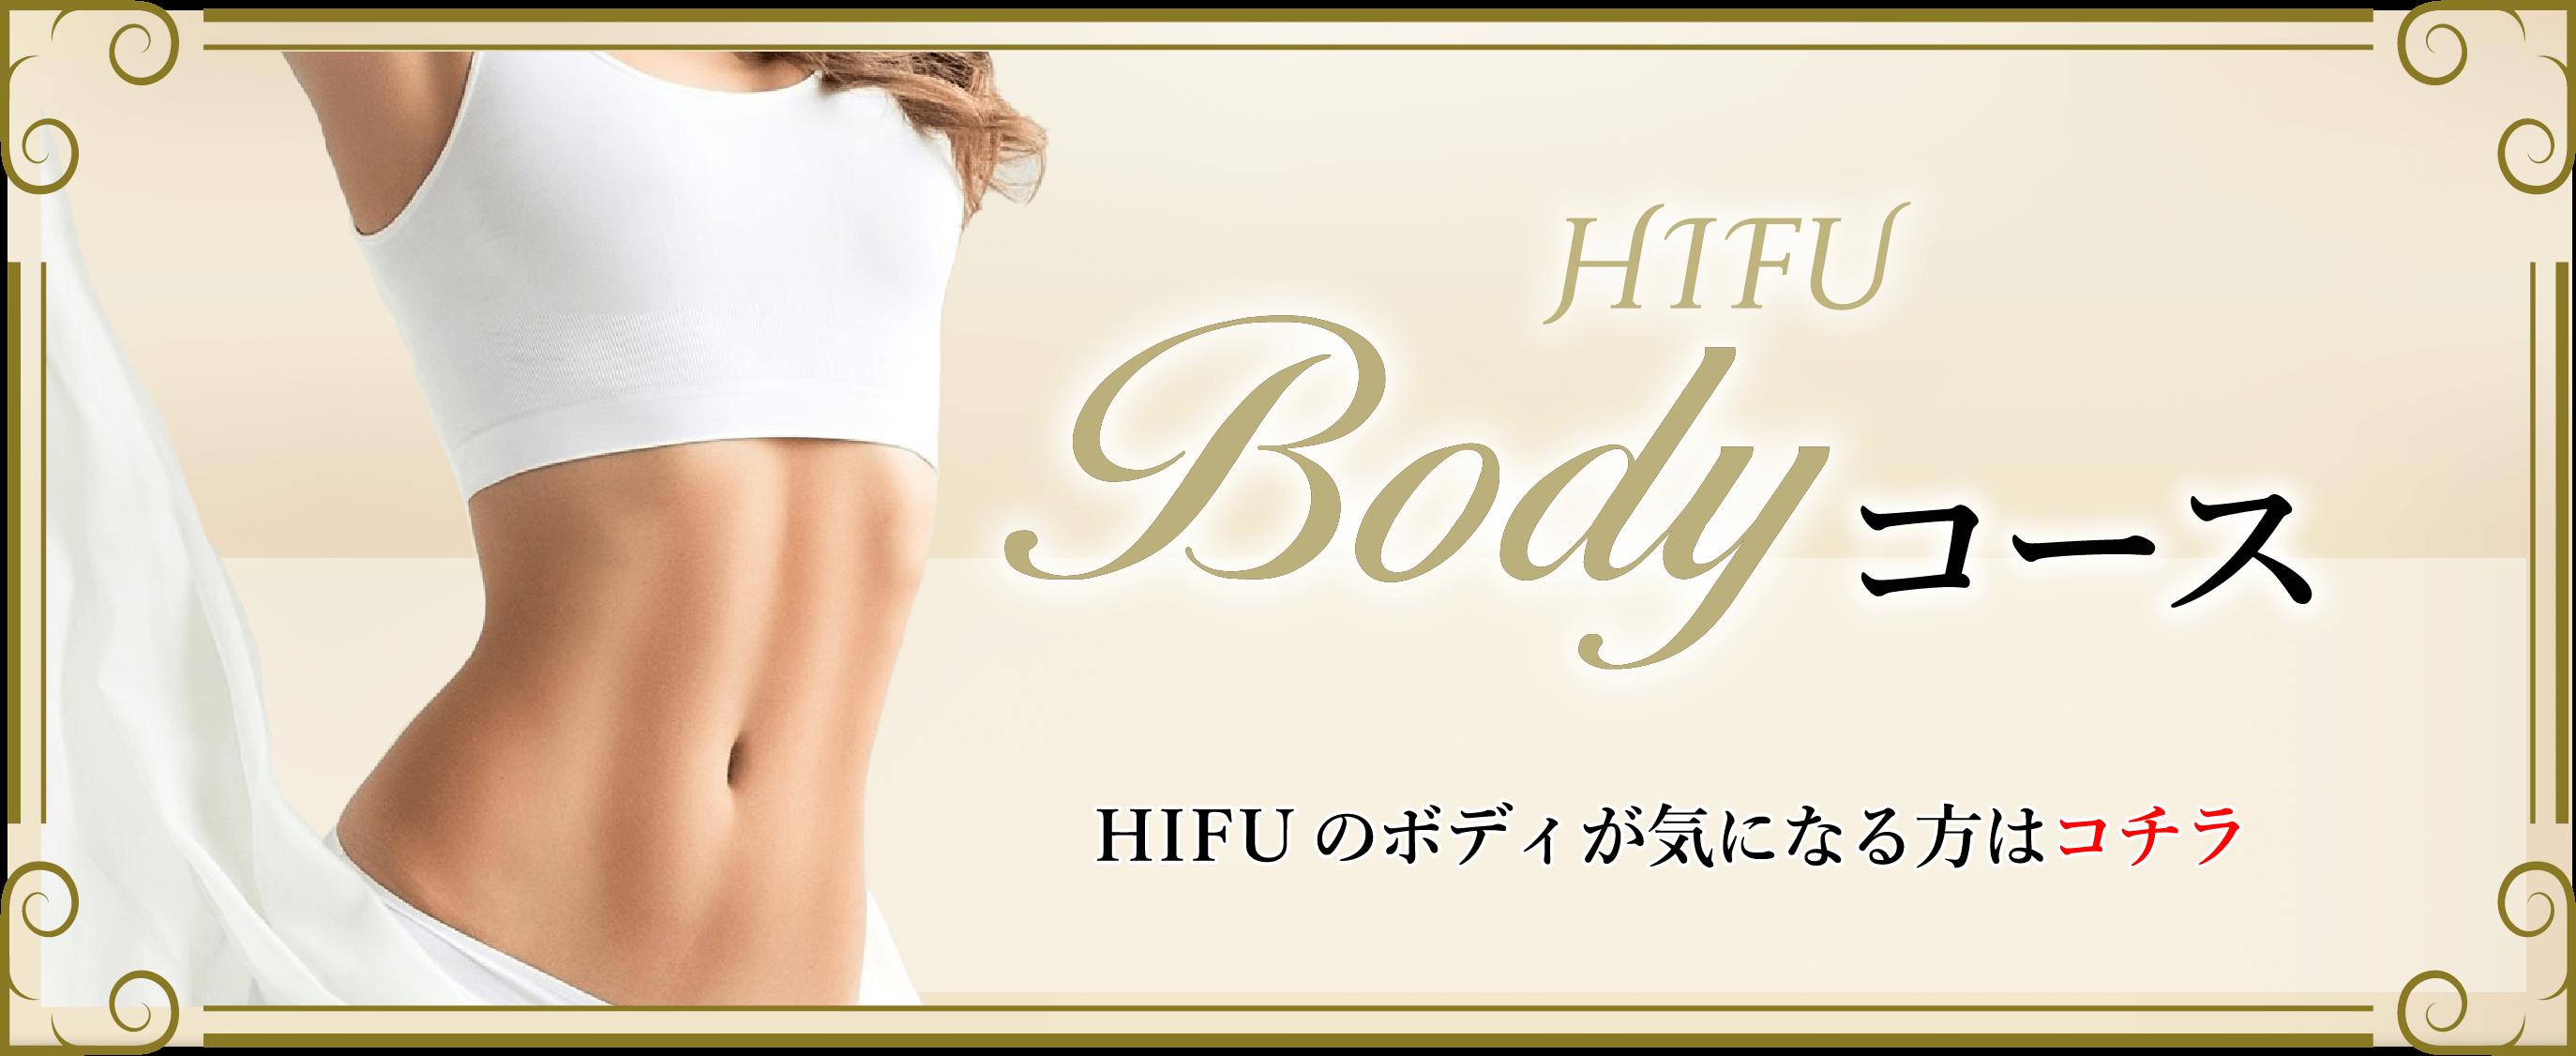 HIFU(ハイフ)bodyコースが気になる方はこちら